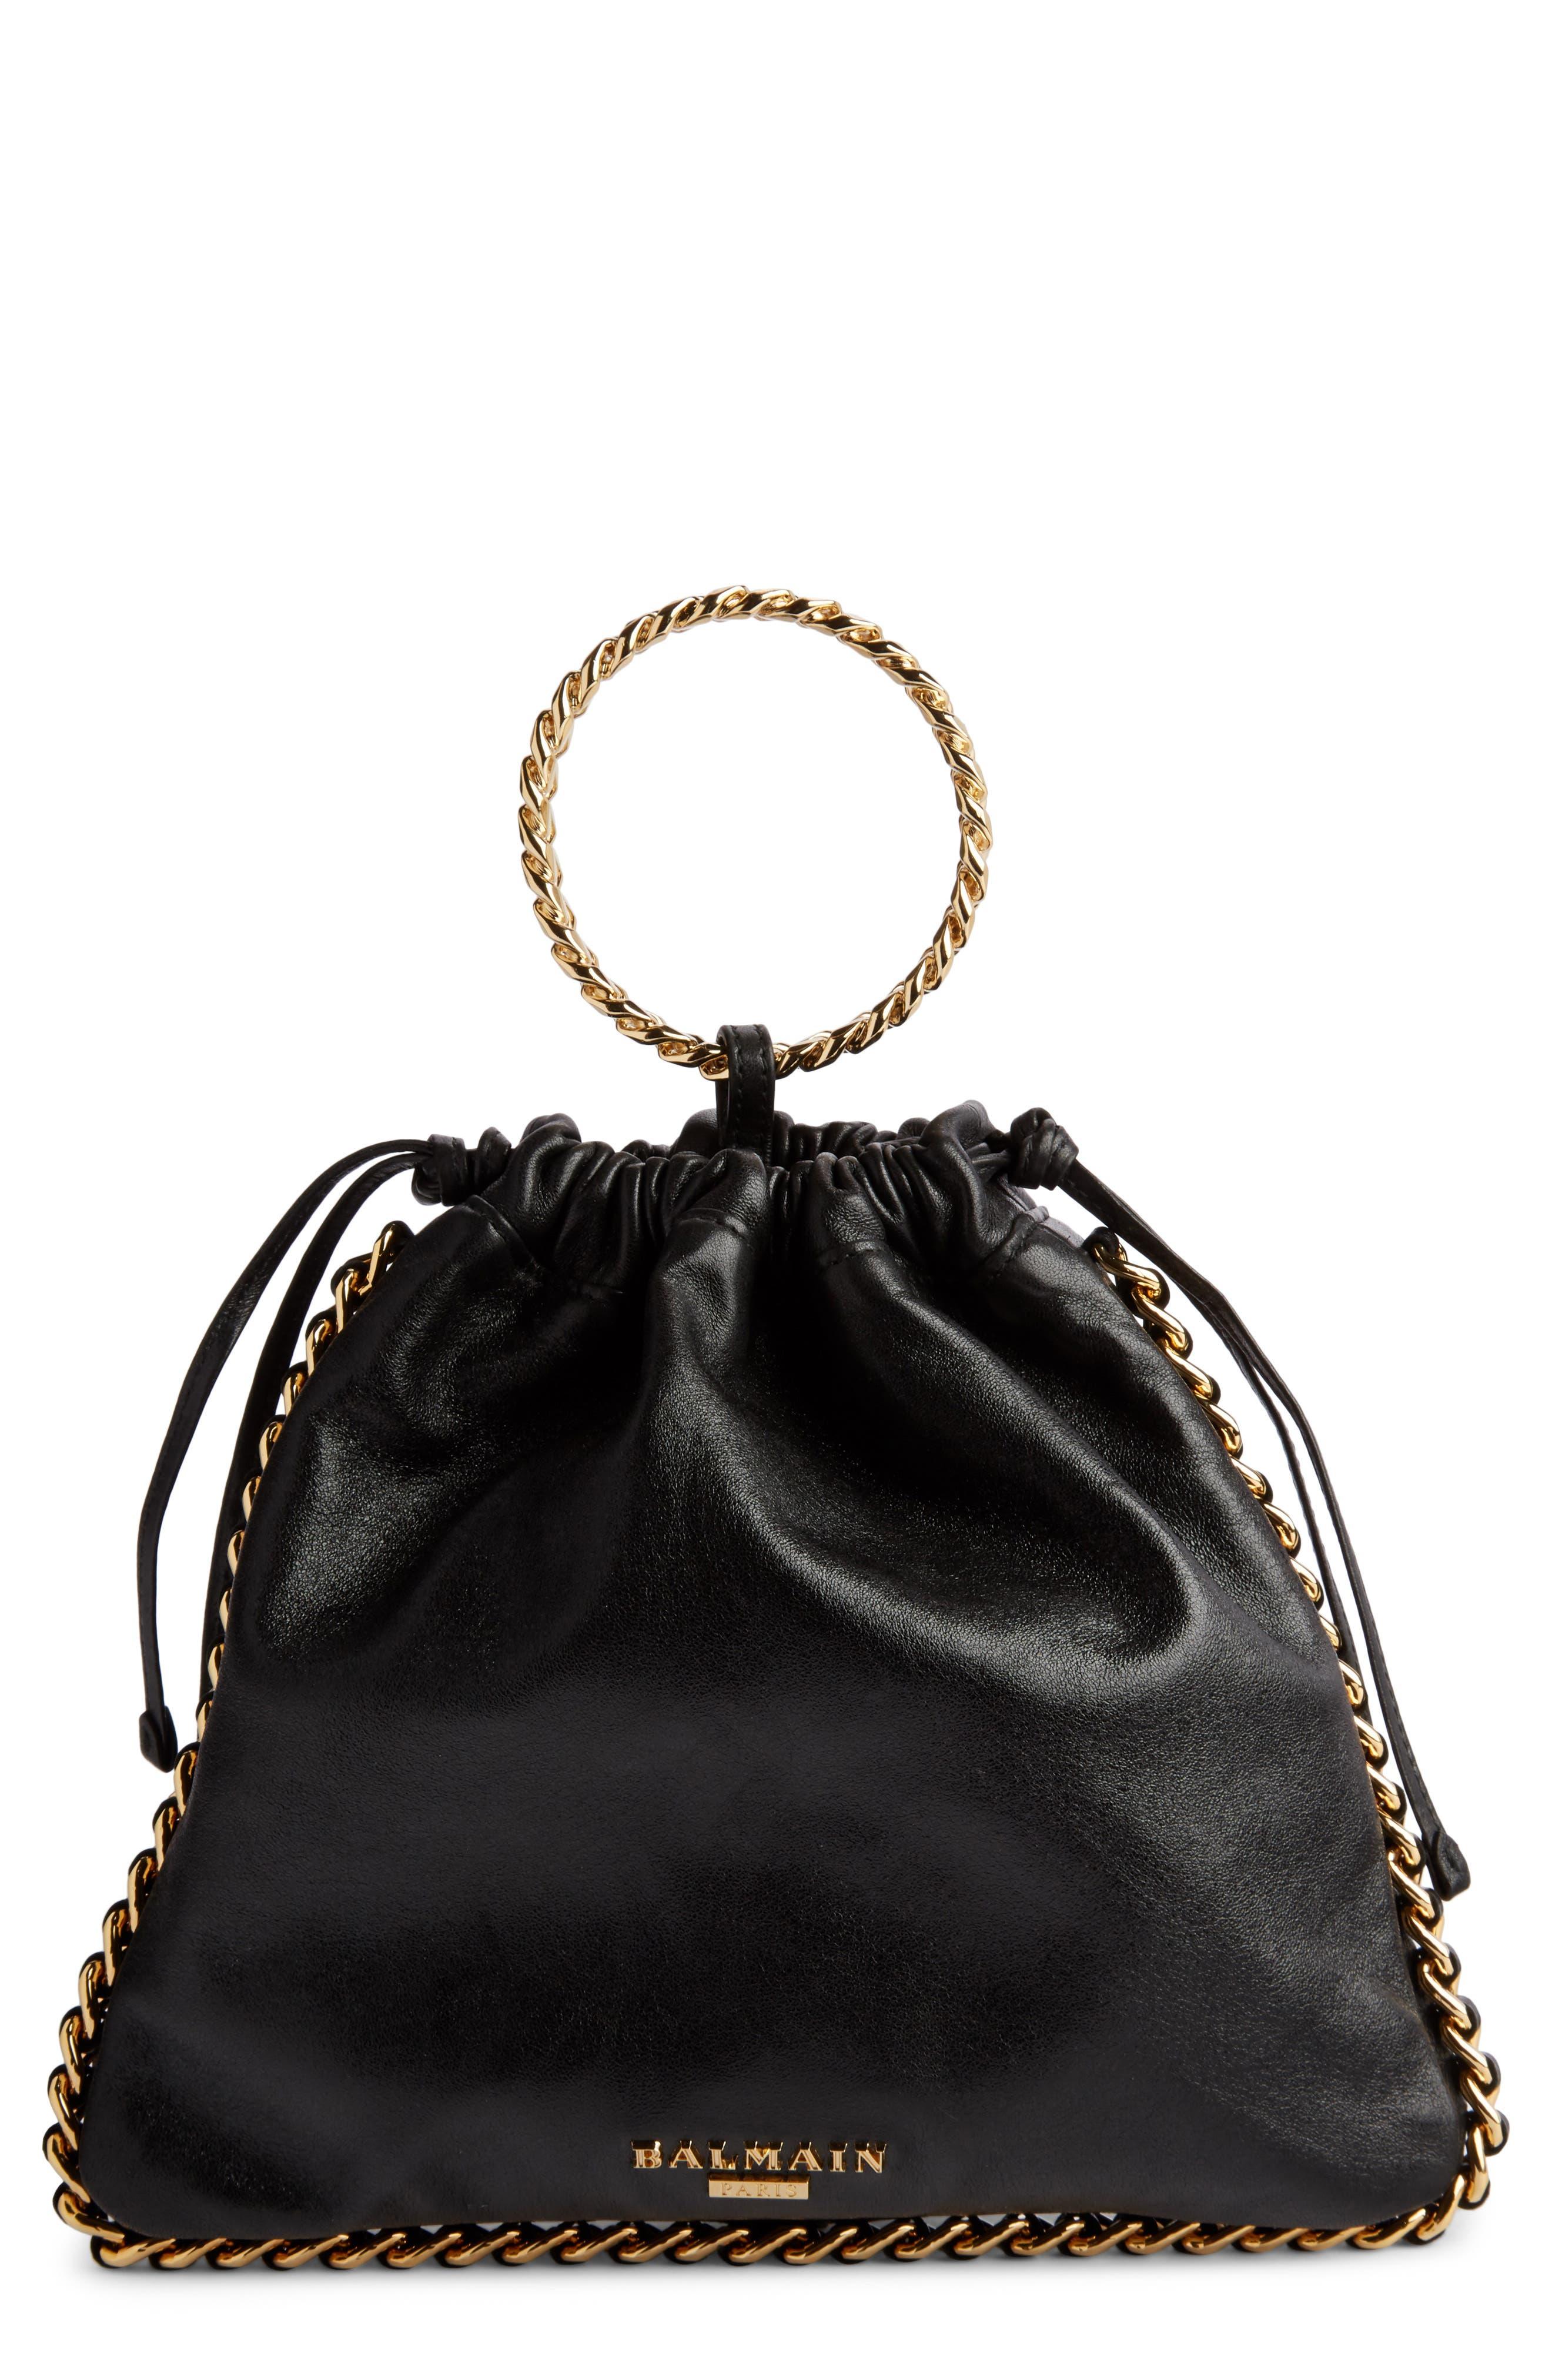 1dff1b6f52b8 Bags Balmain